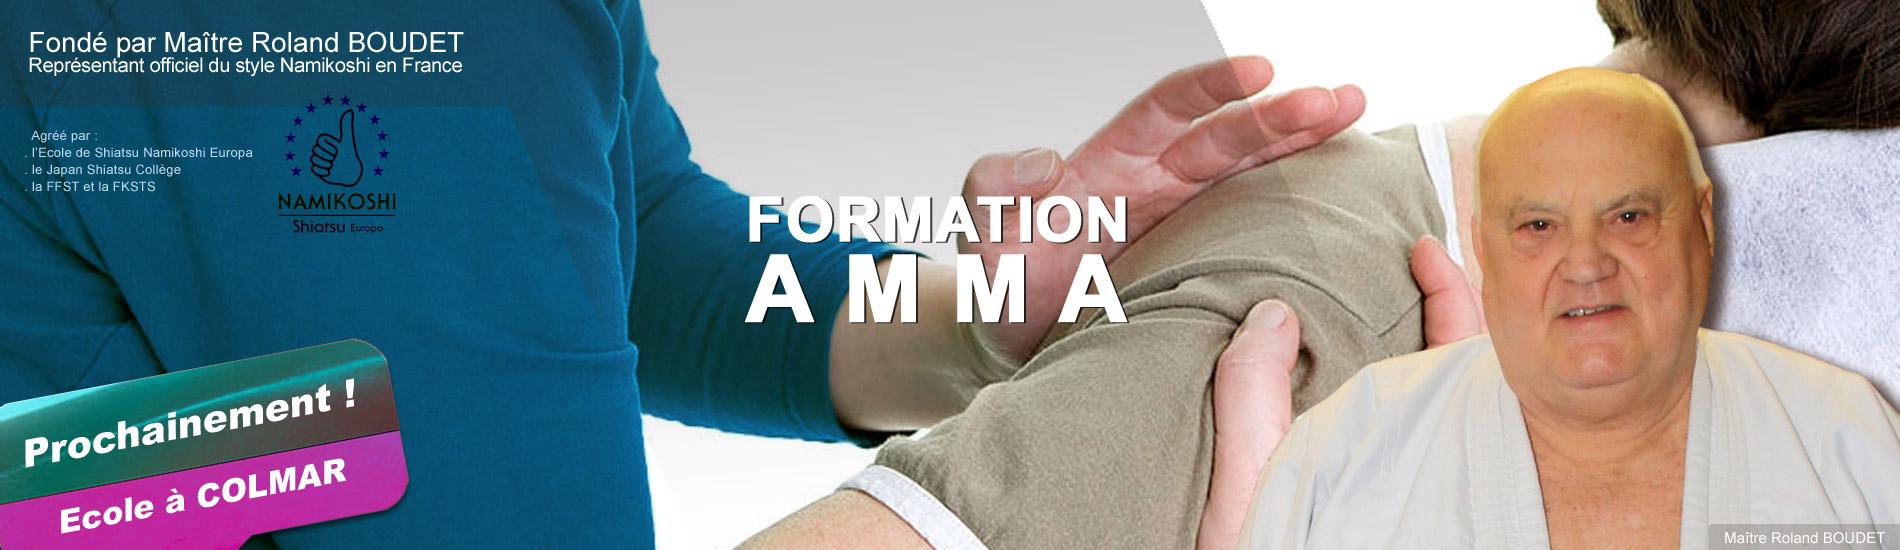 FORMATION</br>AMMA